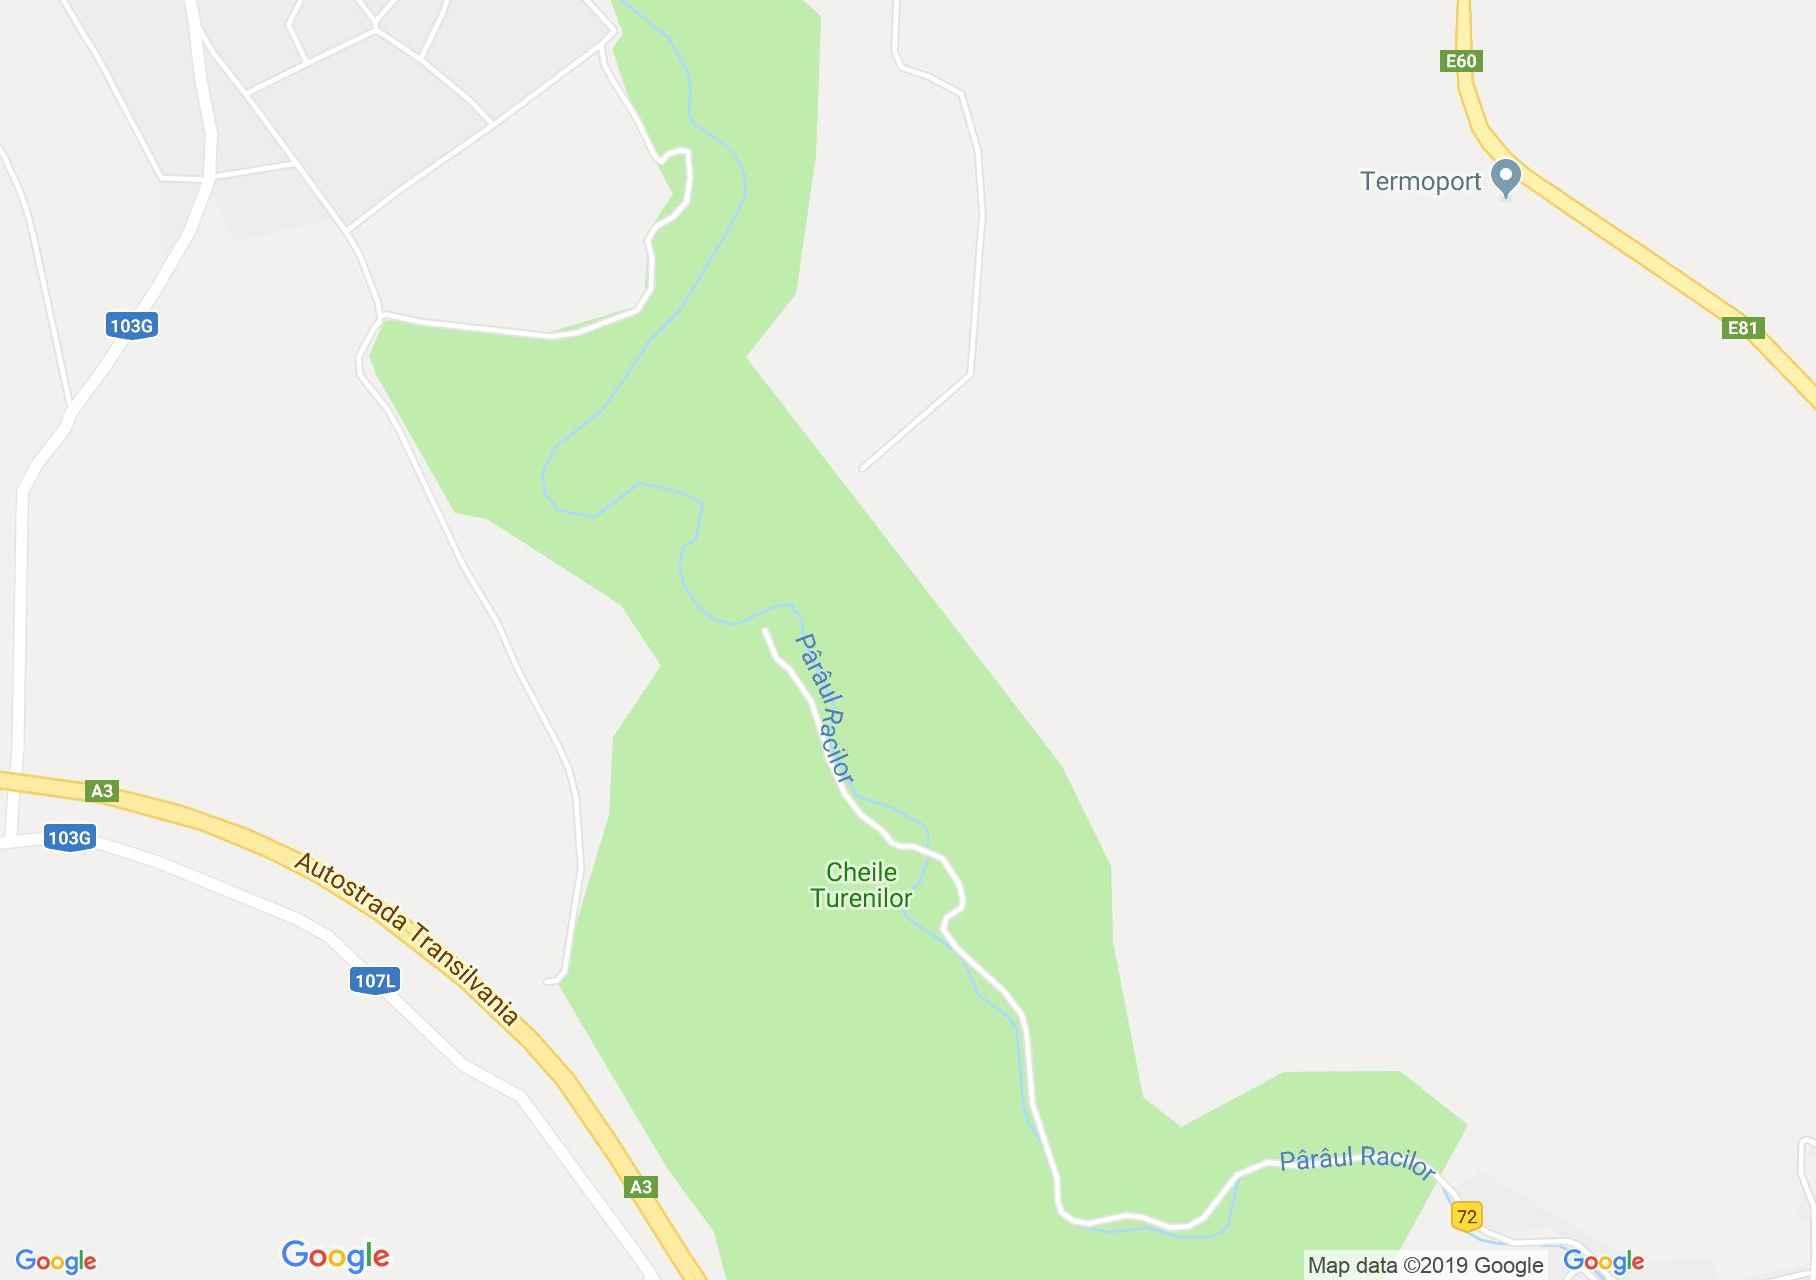 Hartă Tureni: Cheile Tureni